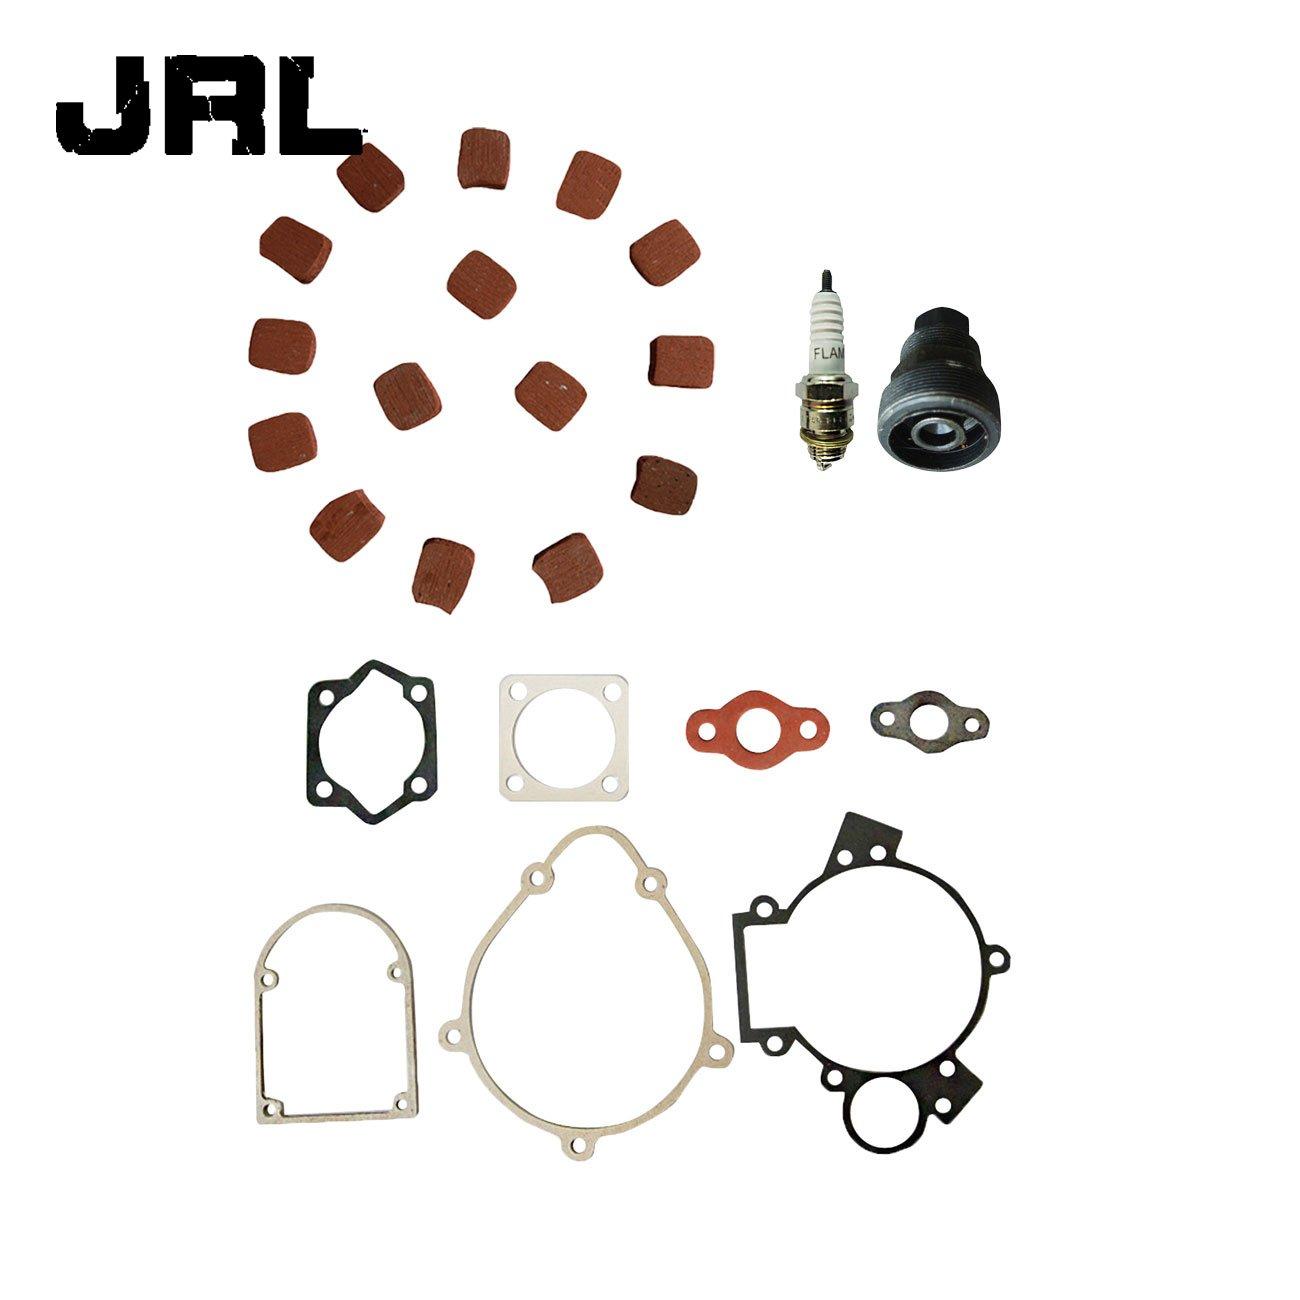 JRL 15xSquare Clutch Pads&Gasket Kit&Clutch Nut For 49cc 66cc 80cc Motorized Bike Nantong Power